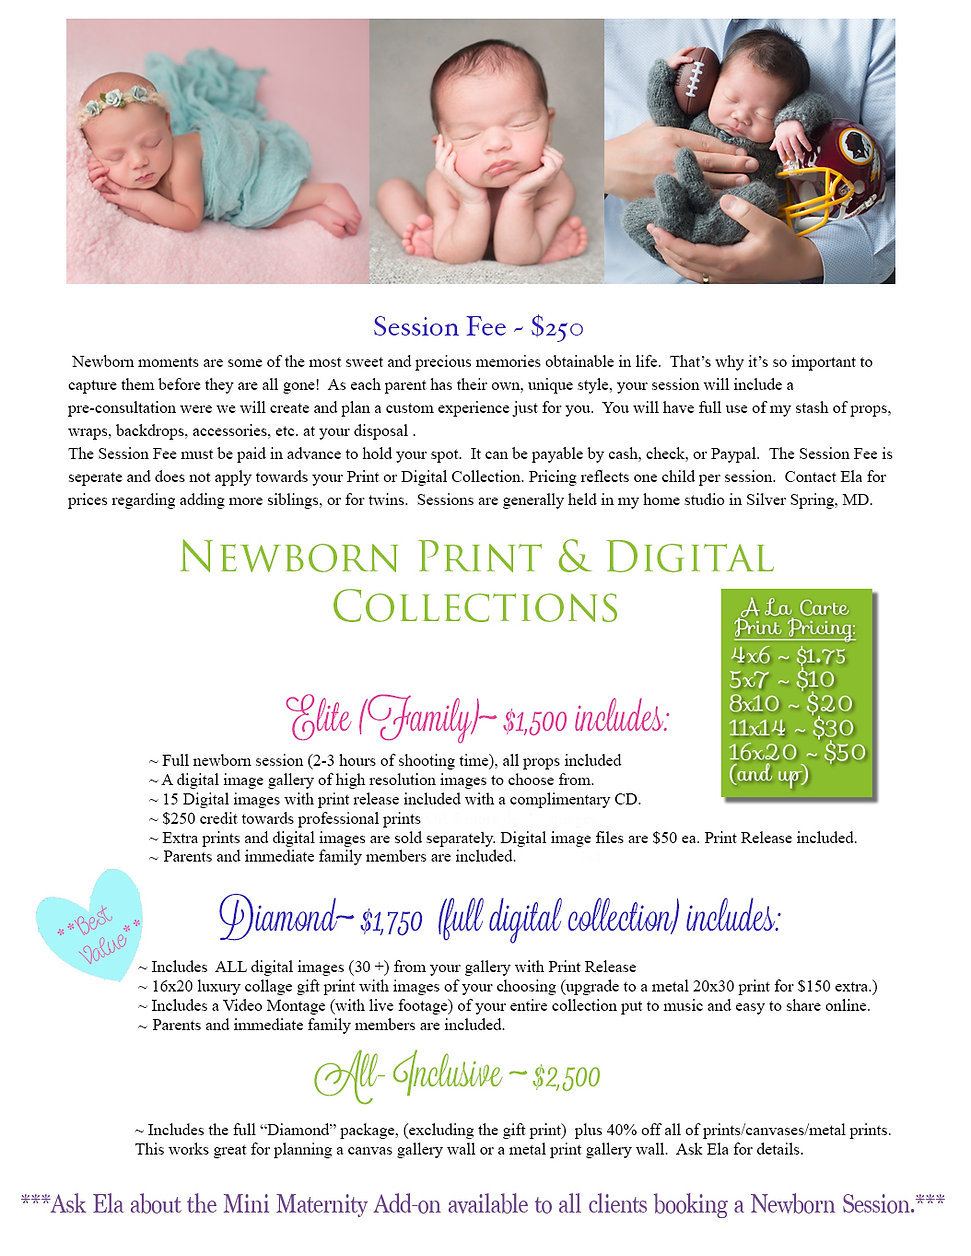 Itsy Newborn DIGITAL Pricing Guide.jpg